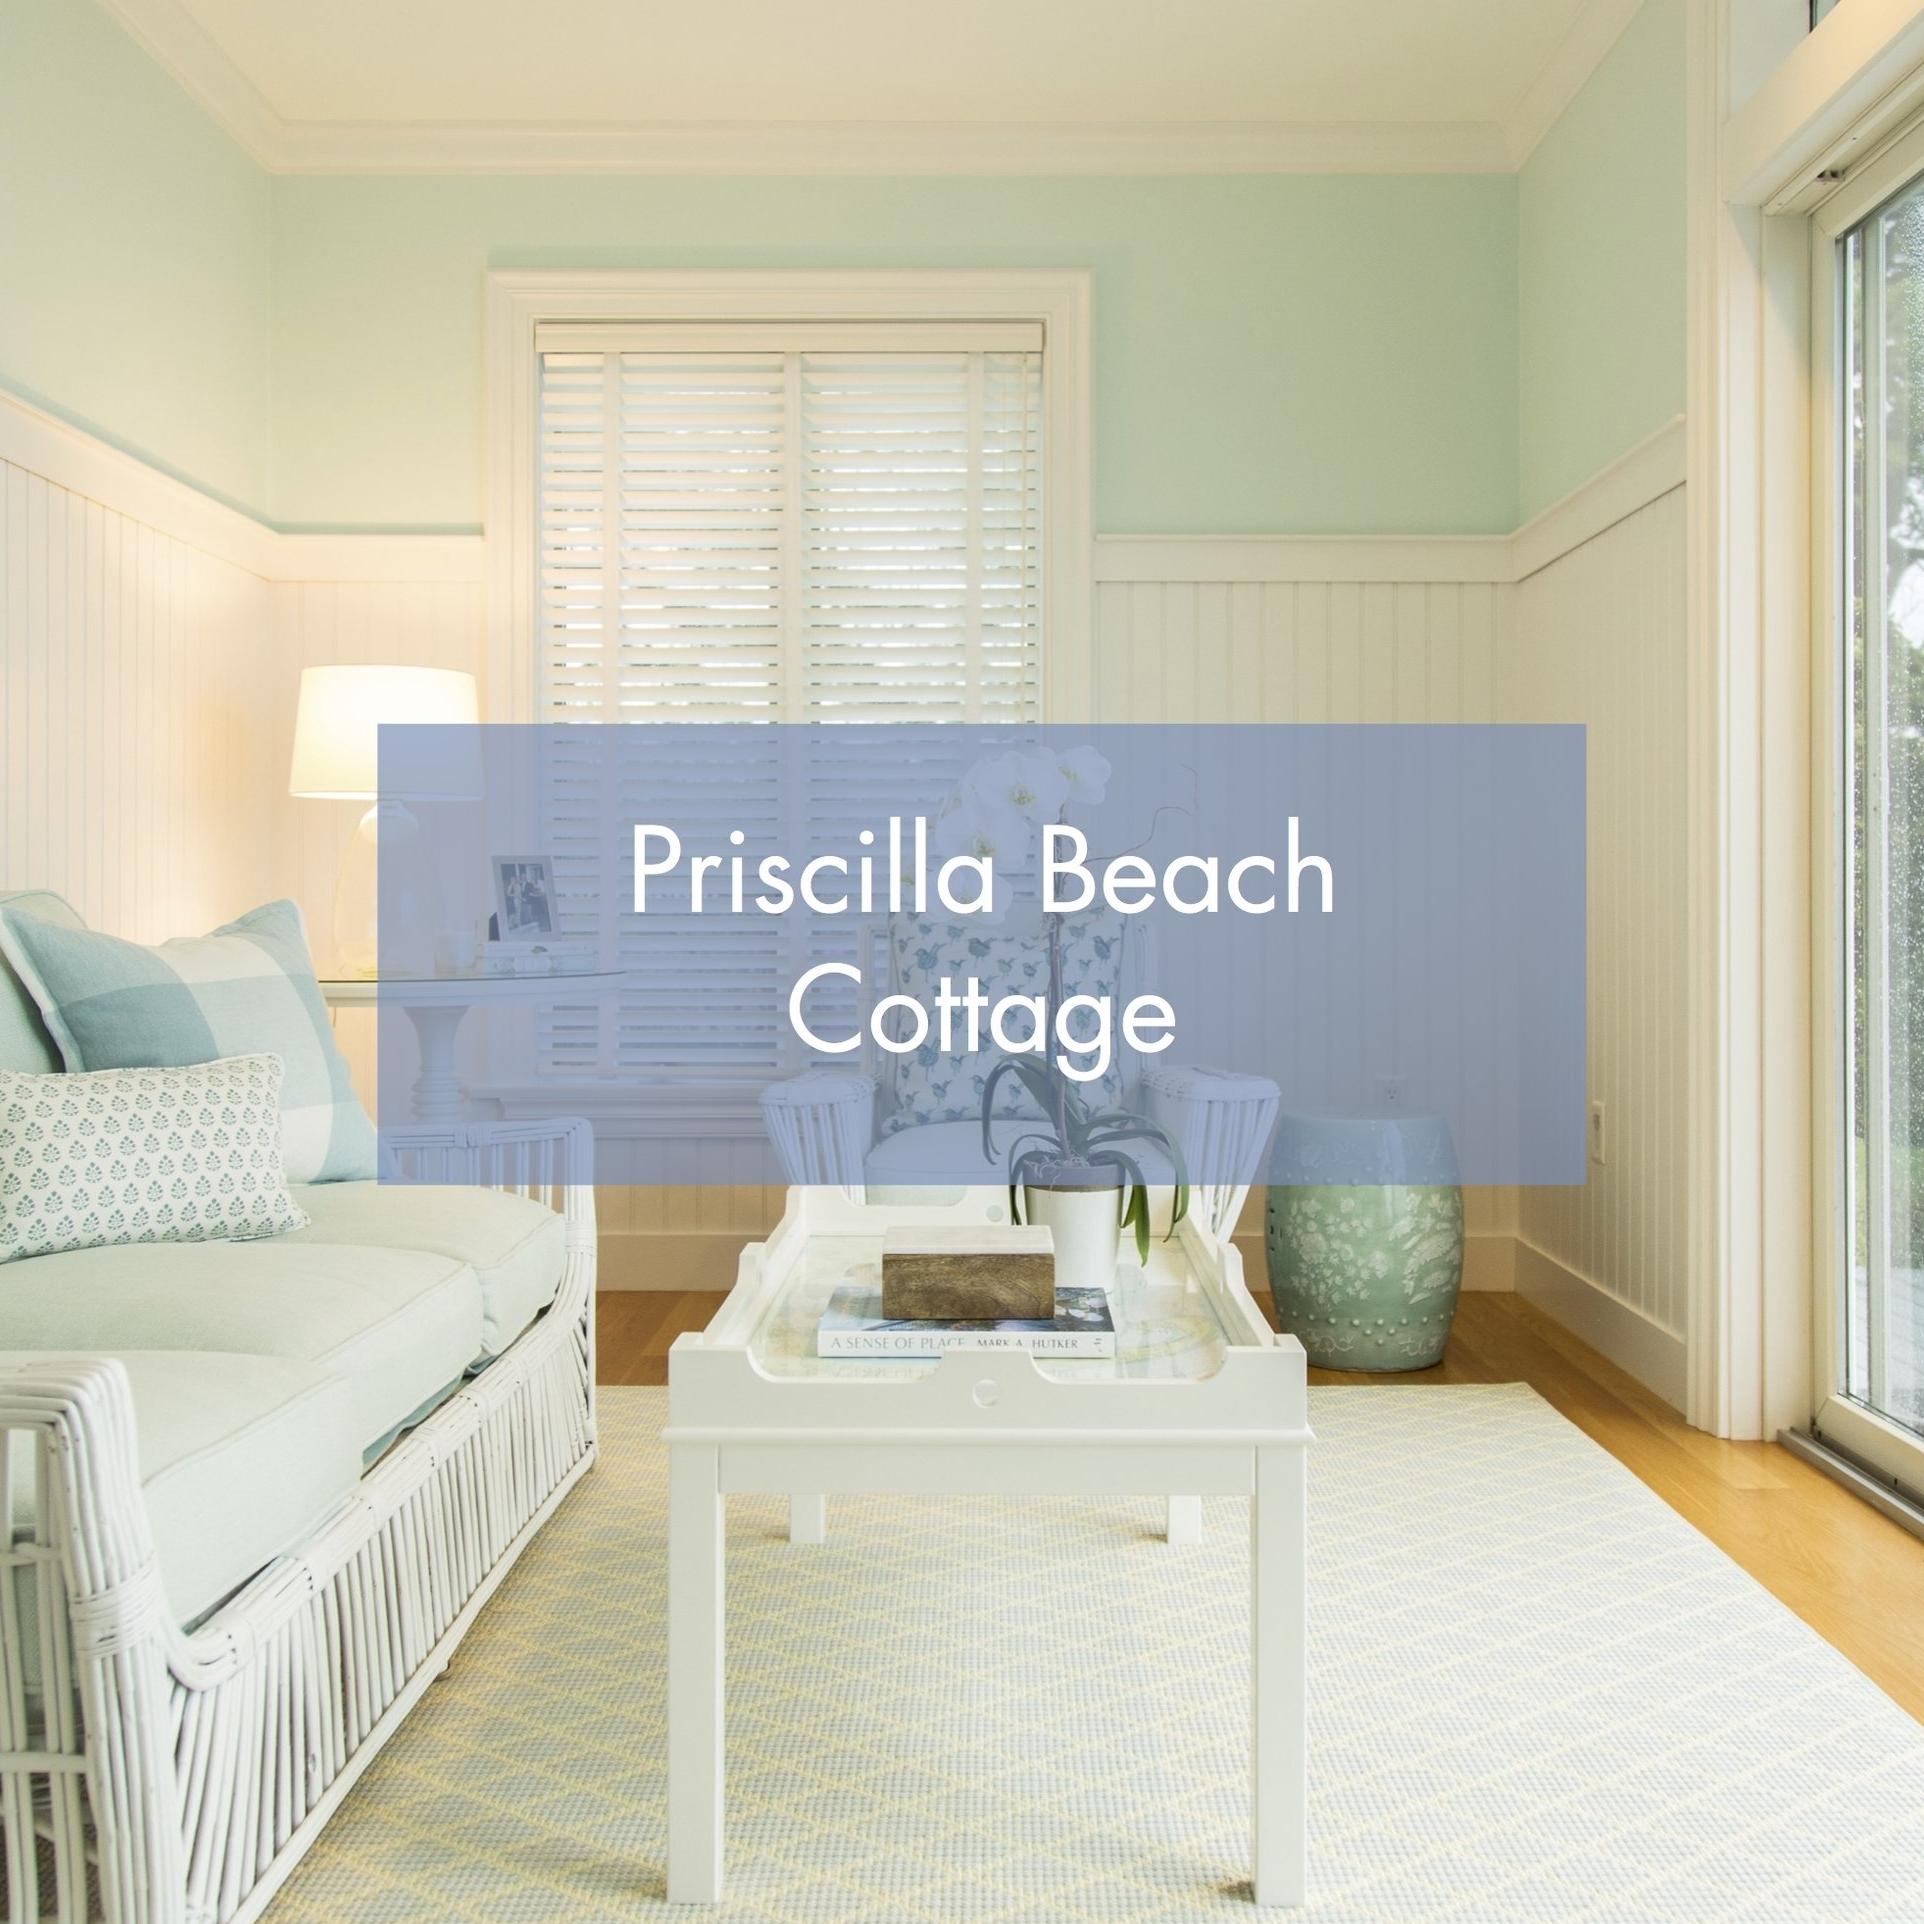 priscilla beach cottage